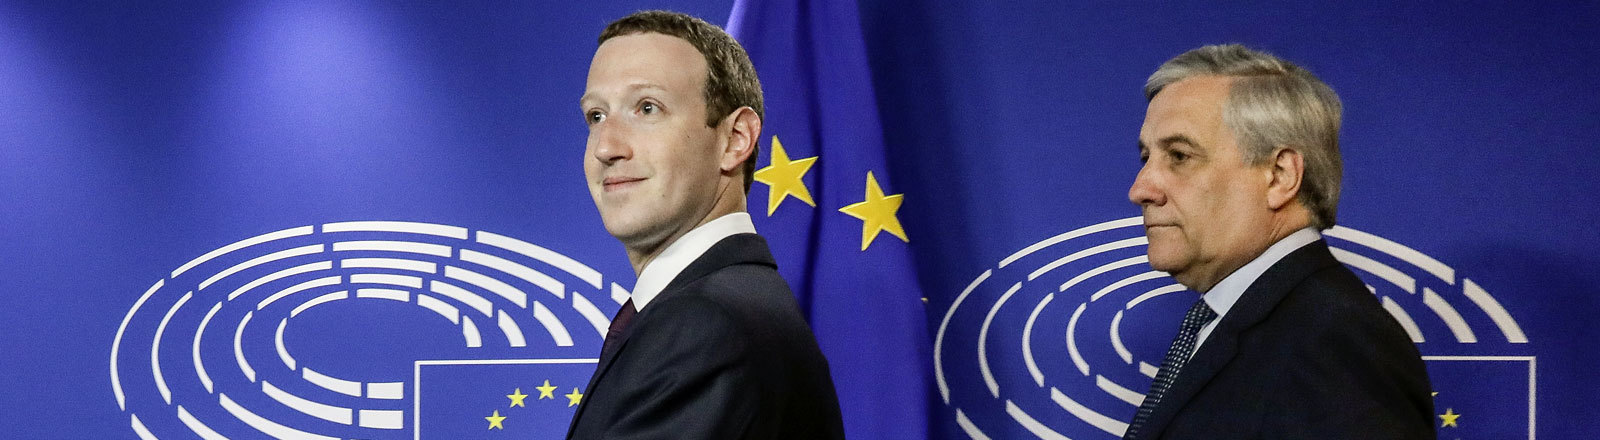 Mark Zuckerberg und Antonio Tajani im EU-Parlament